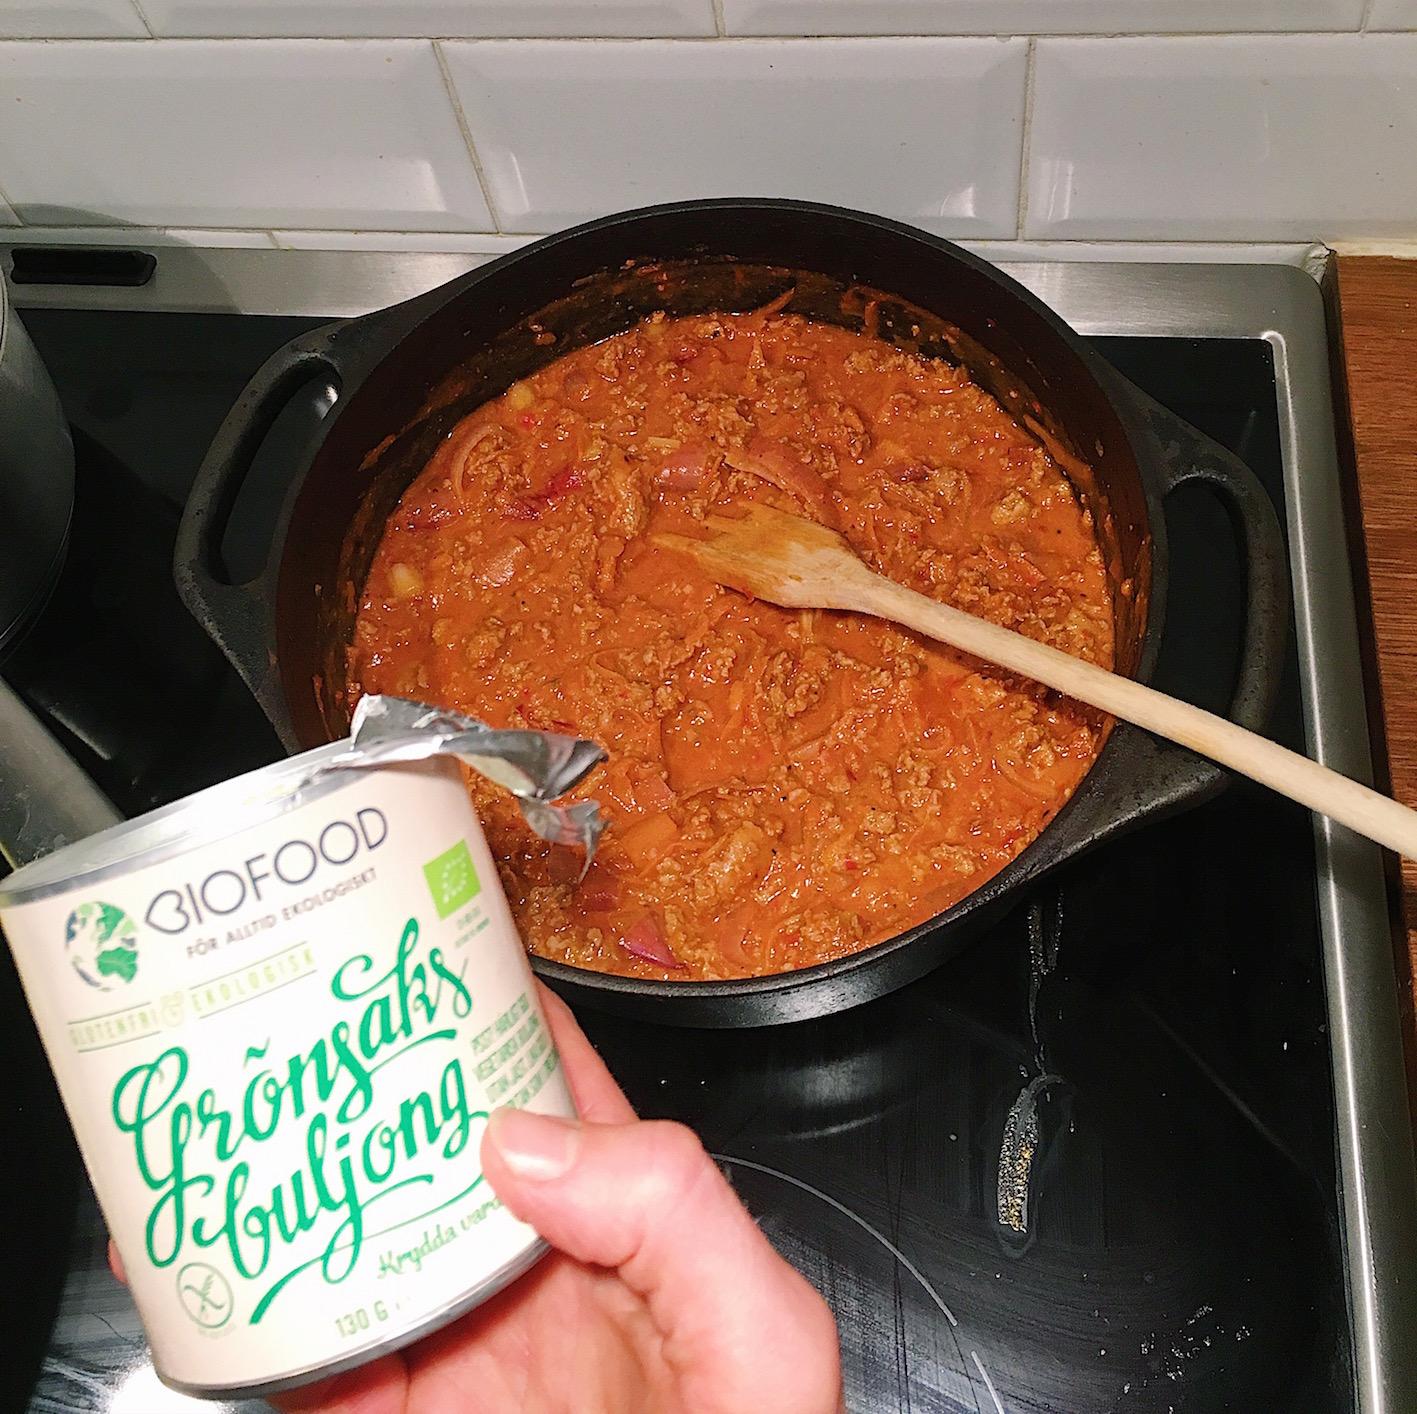 biofood - grönsaksbuljong